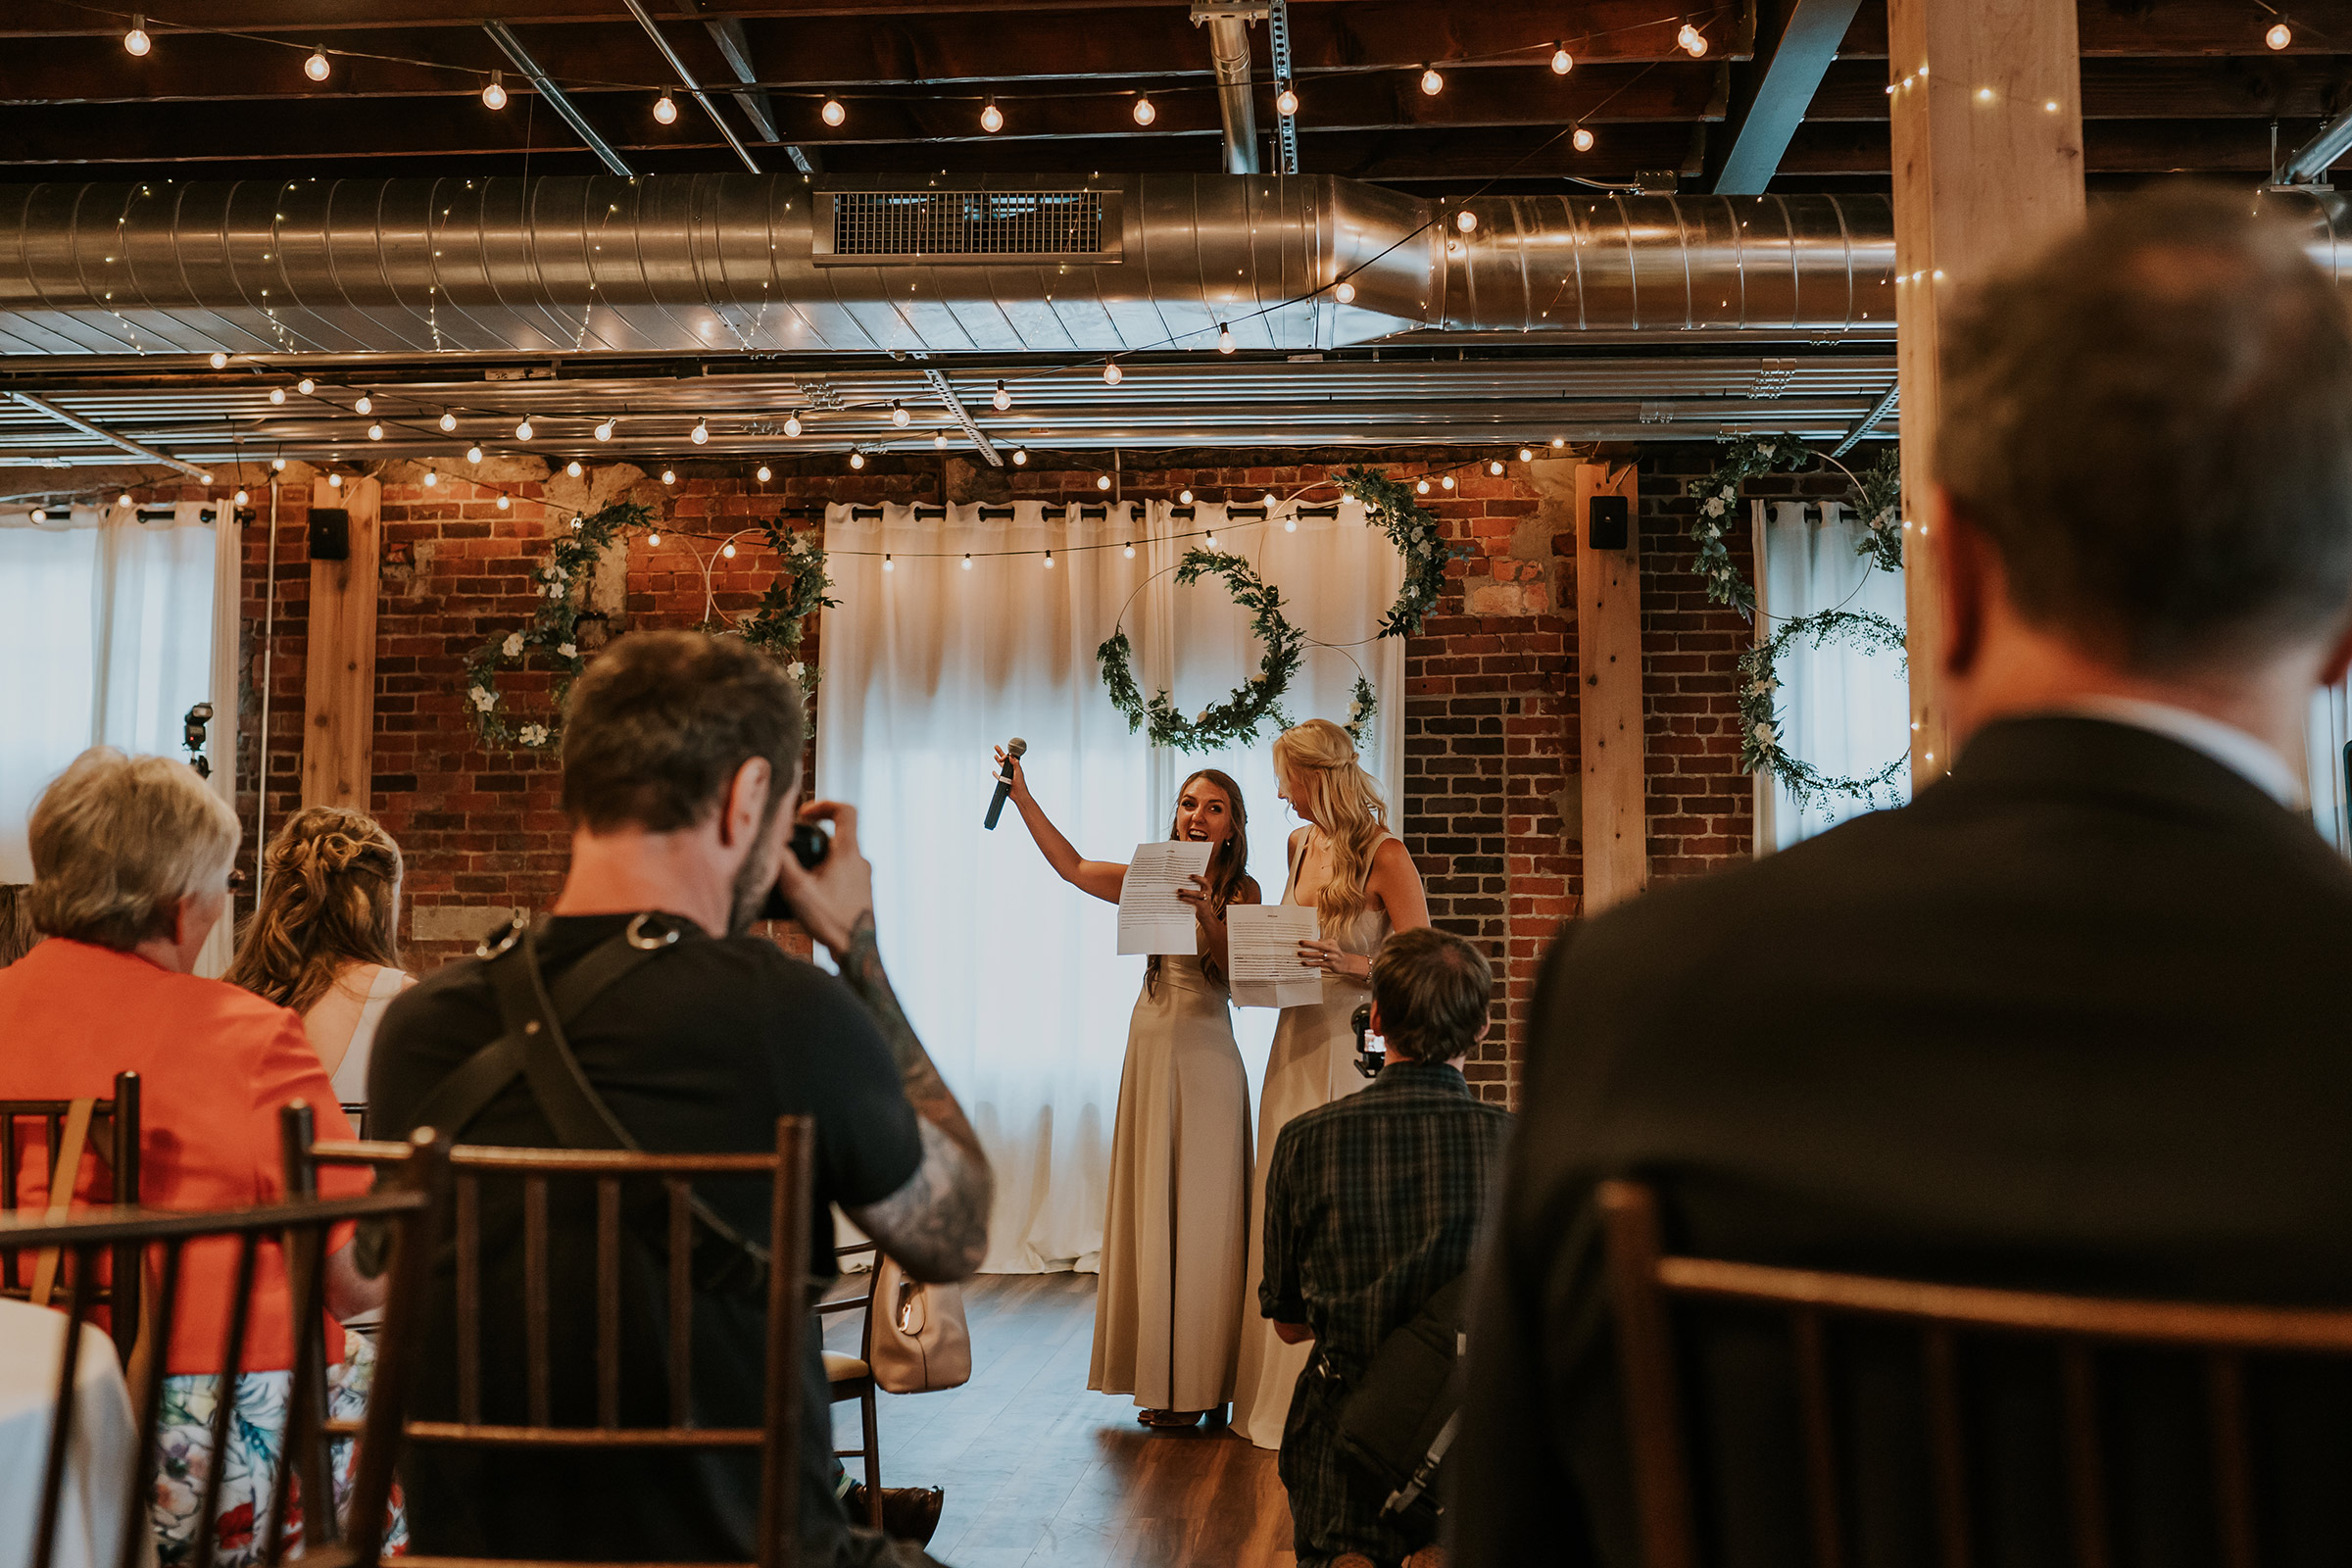 mr-mrs-hull-wedding-bridesmaid-speech-iowa-taproom-desmoines-iowa-raelyn-ramey-photography-633.jpg